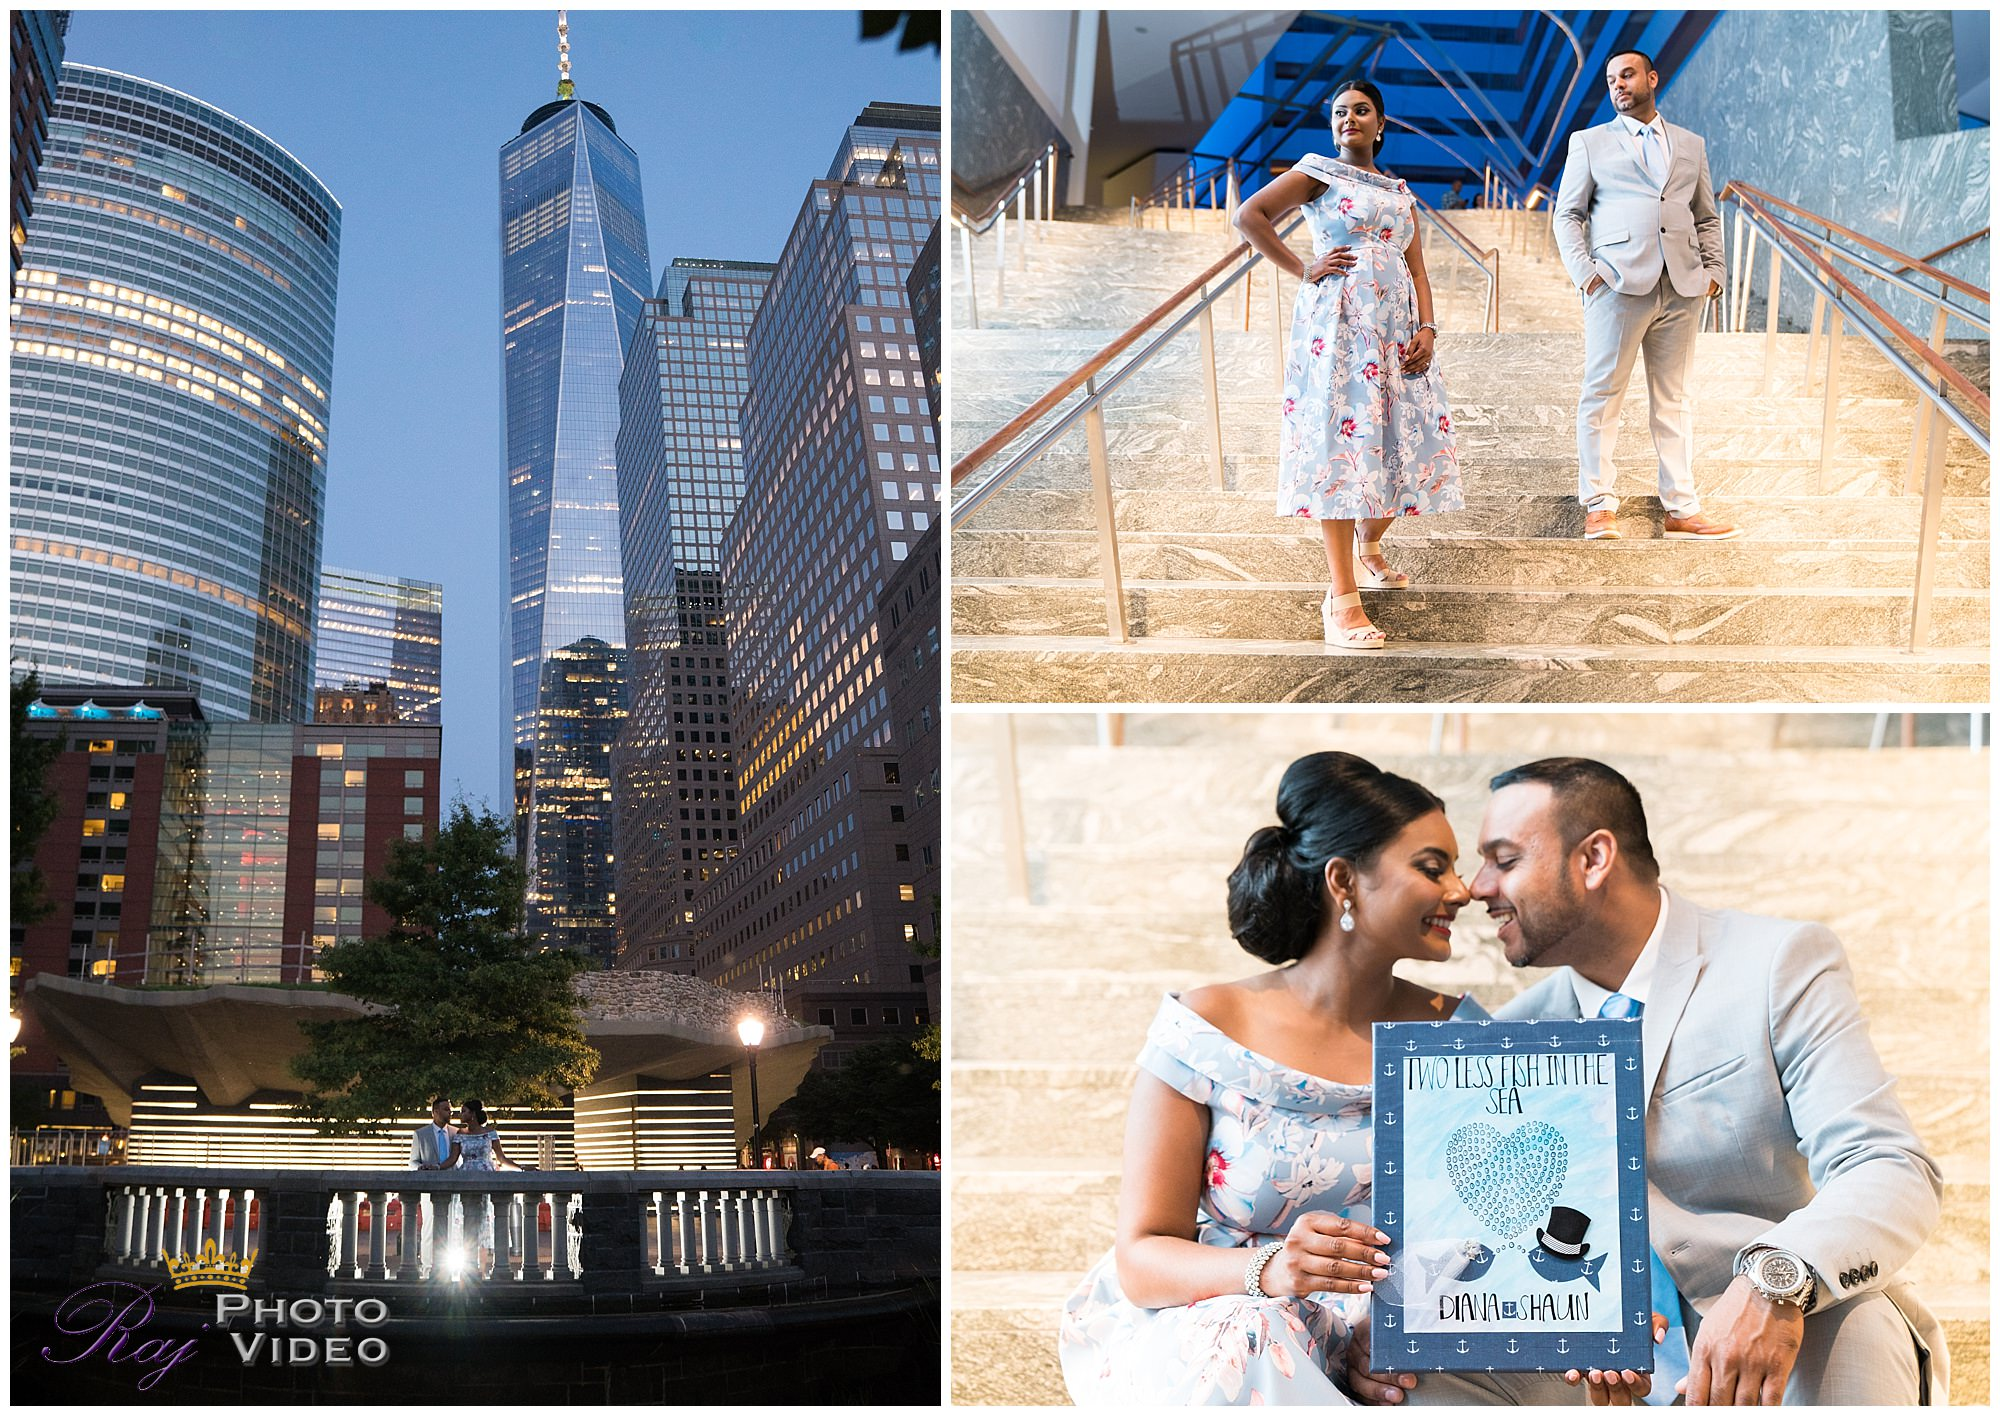 Conrad-Hotel-New-York-City-Engagement-Shoot-Diana-Shaun-6.jpg